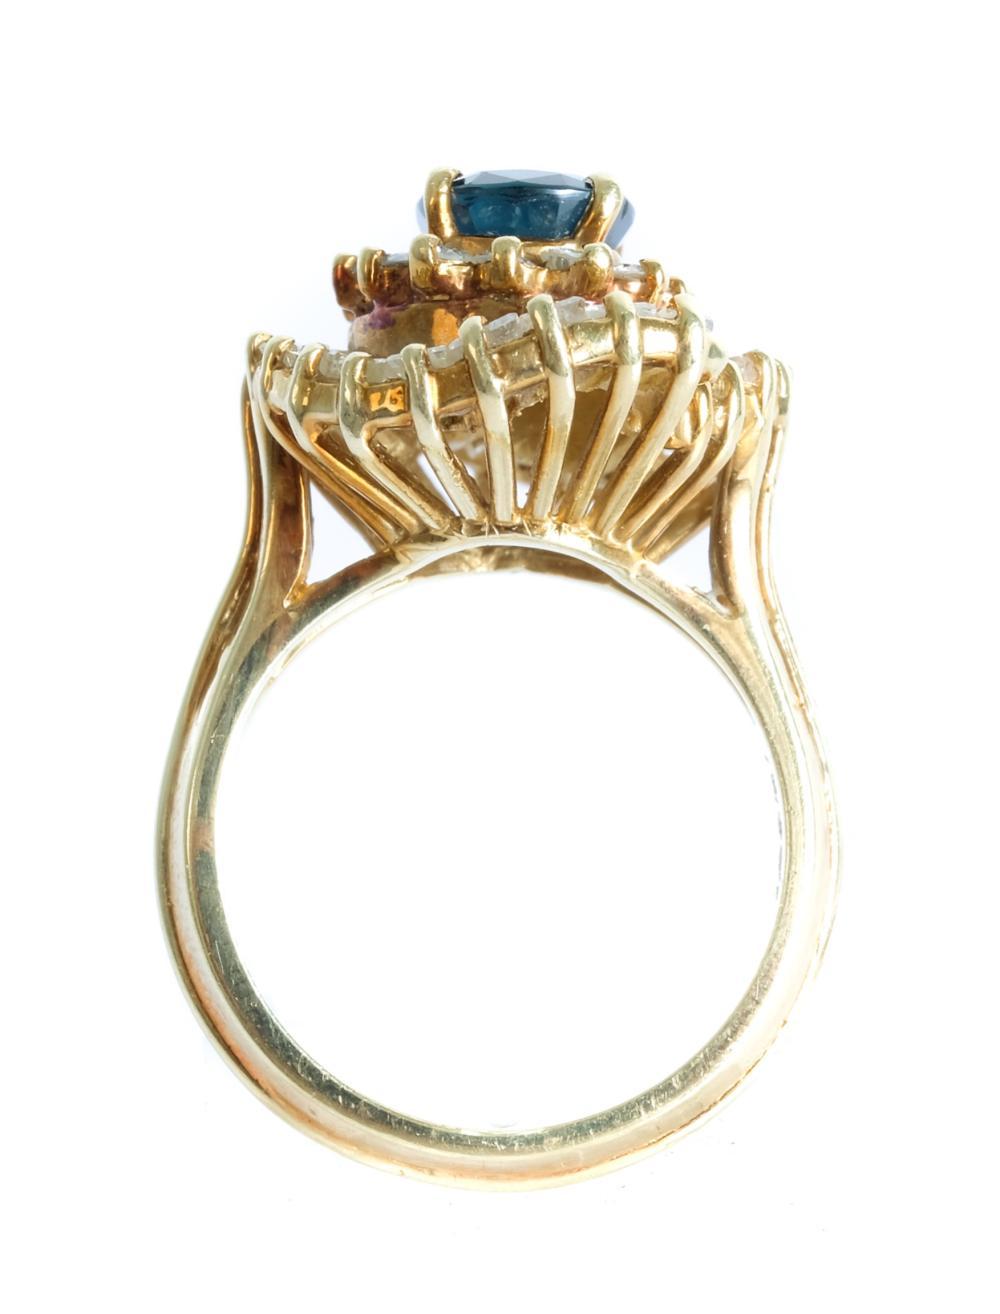 14k YG Diamond & Sapphire Ring, Size 6